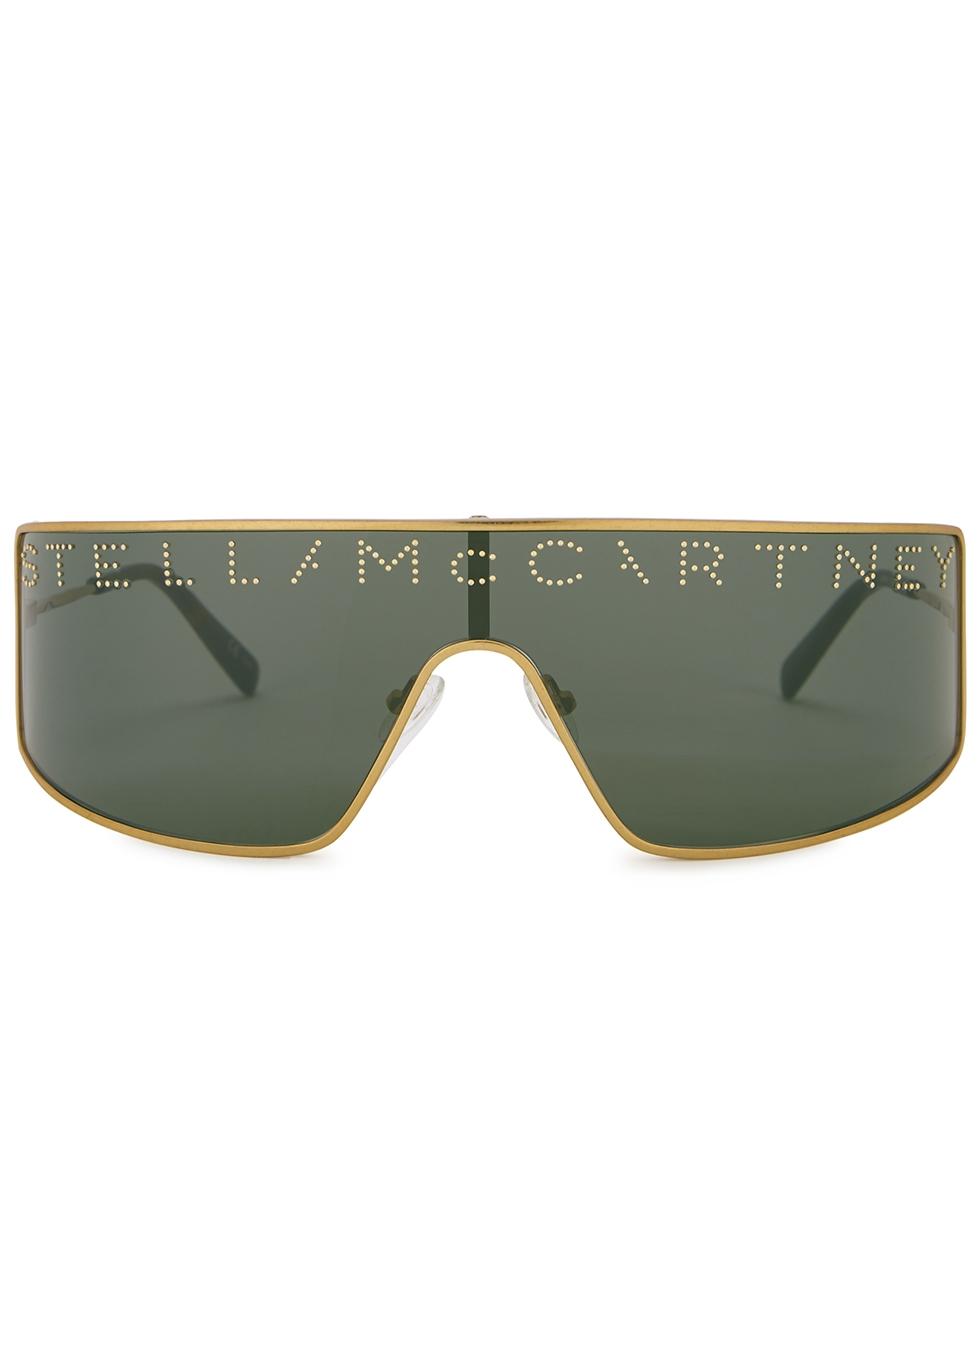 Gold-tone aviator-style sunglasses - Stella McCartney